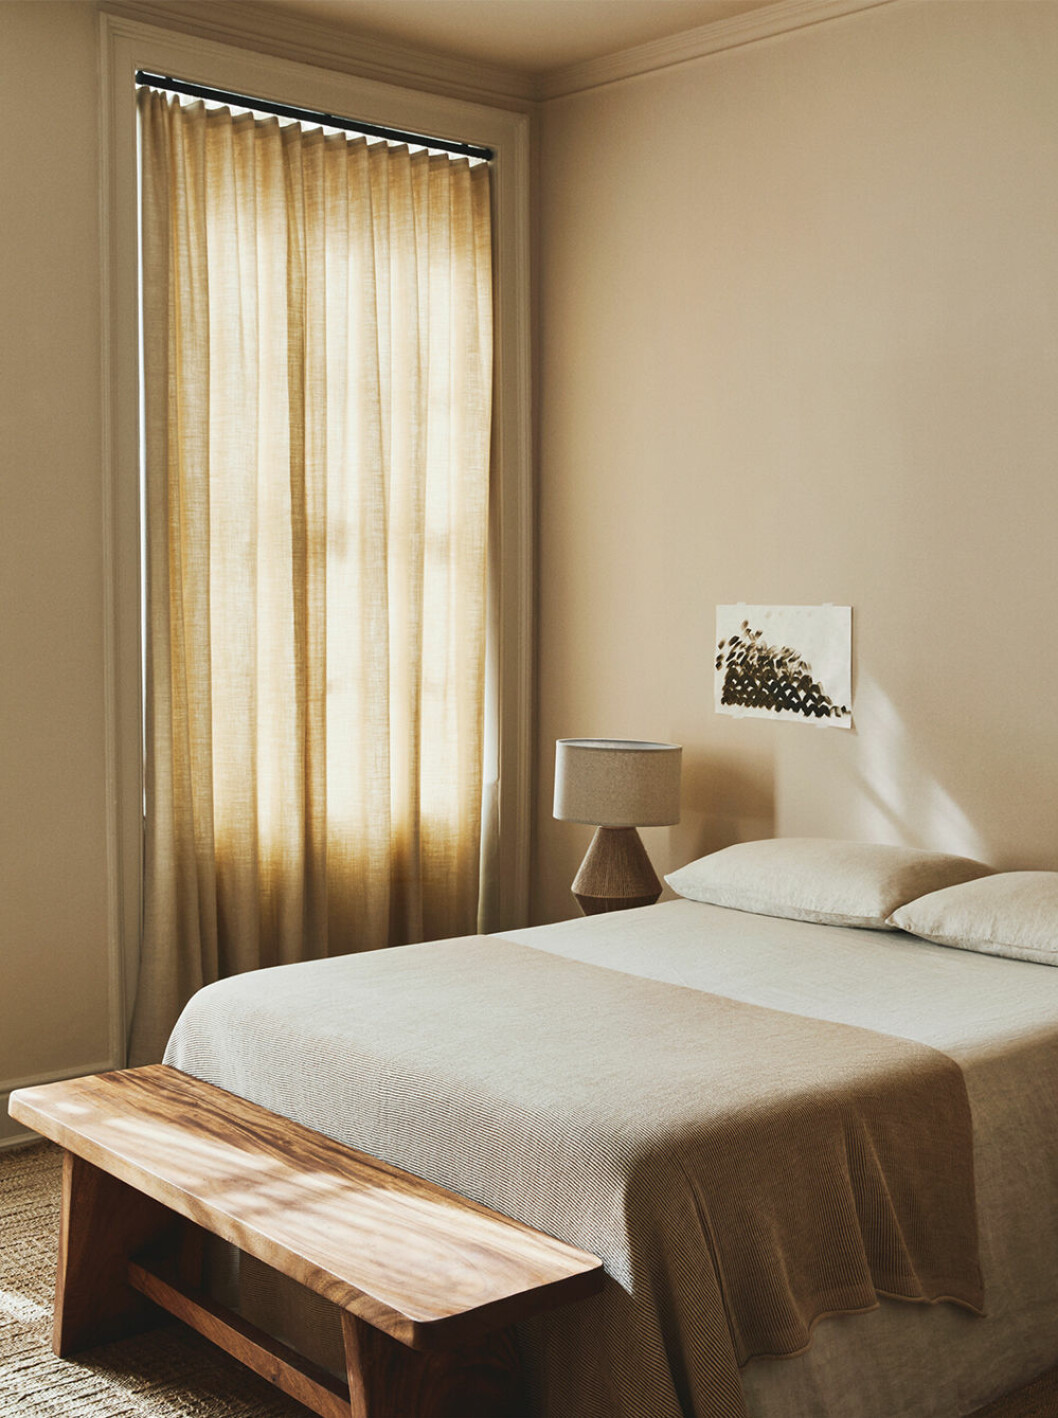 Sovrum i beige och naturmaterial hos Zara Home 2020